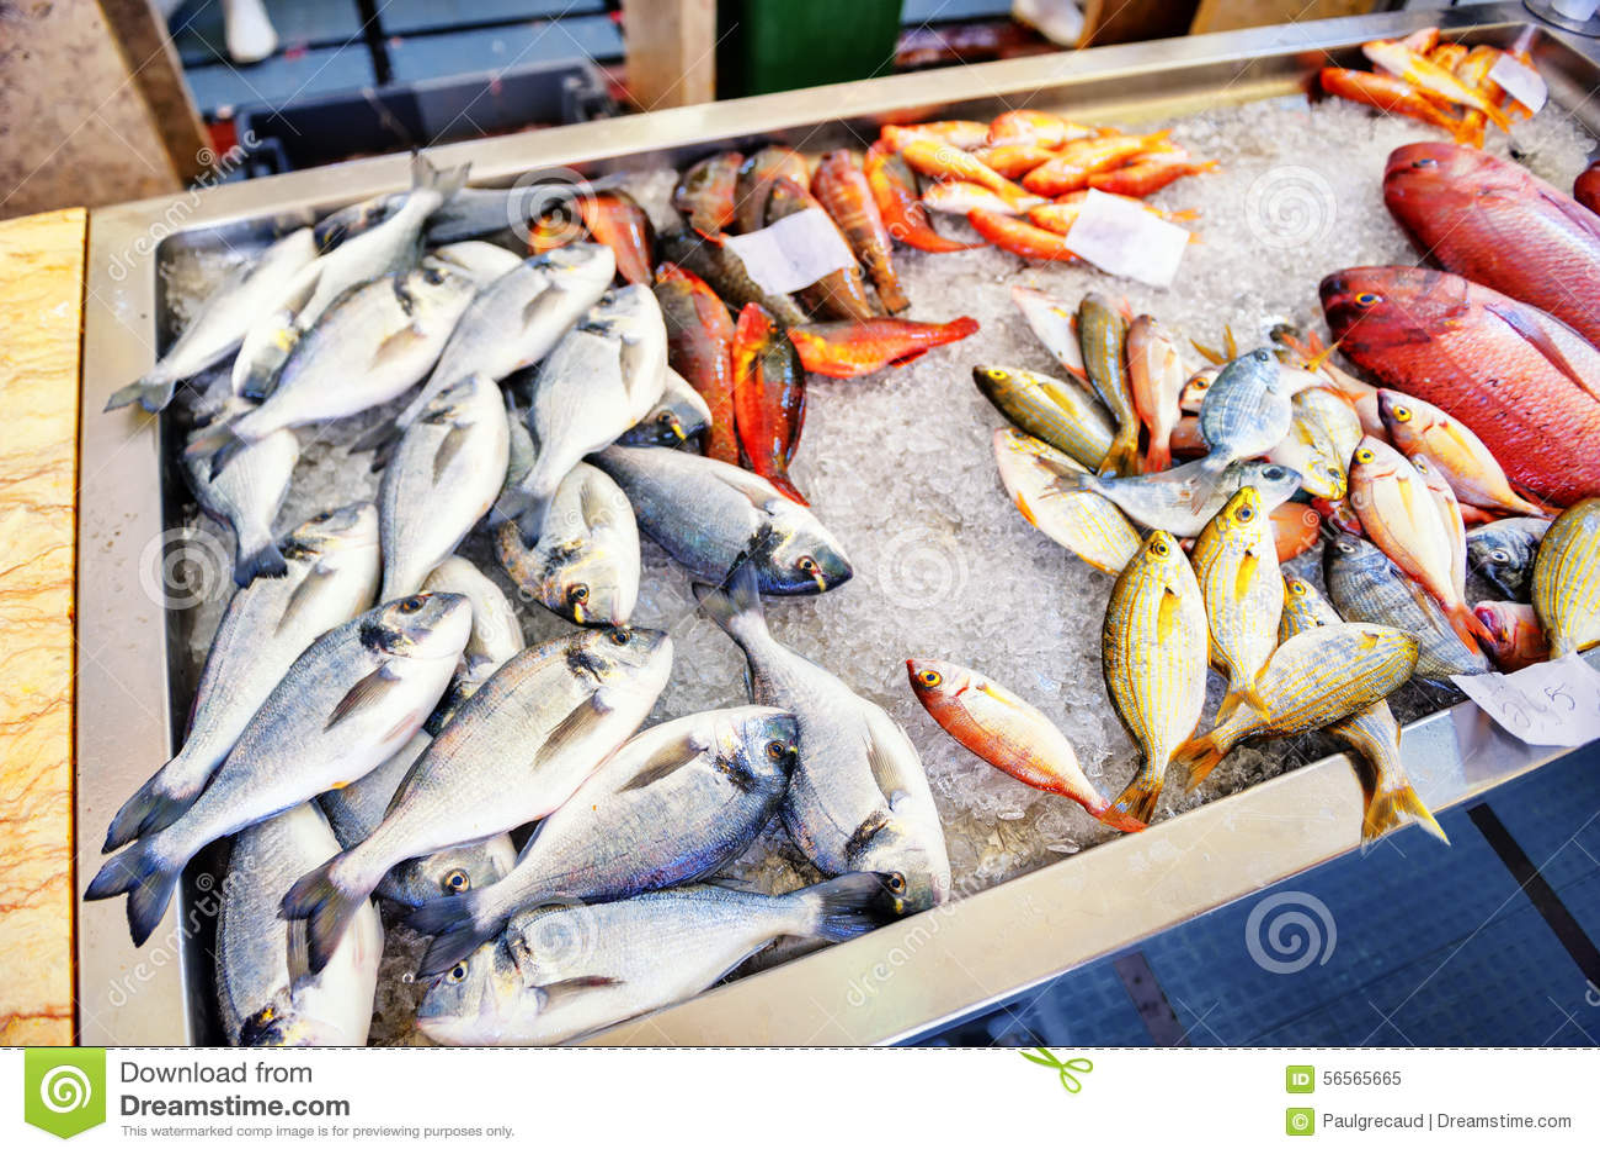 Download φρέσκος πάγος ψαριών Αγορά ψαριών στο νησί της Μαδέρας Στοκ Εικόνα - εικόνα από μετρητής, dorado: 56565665